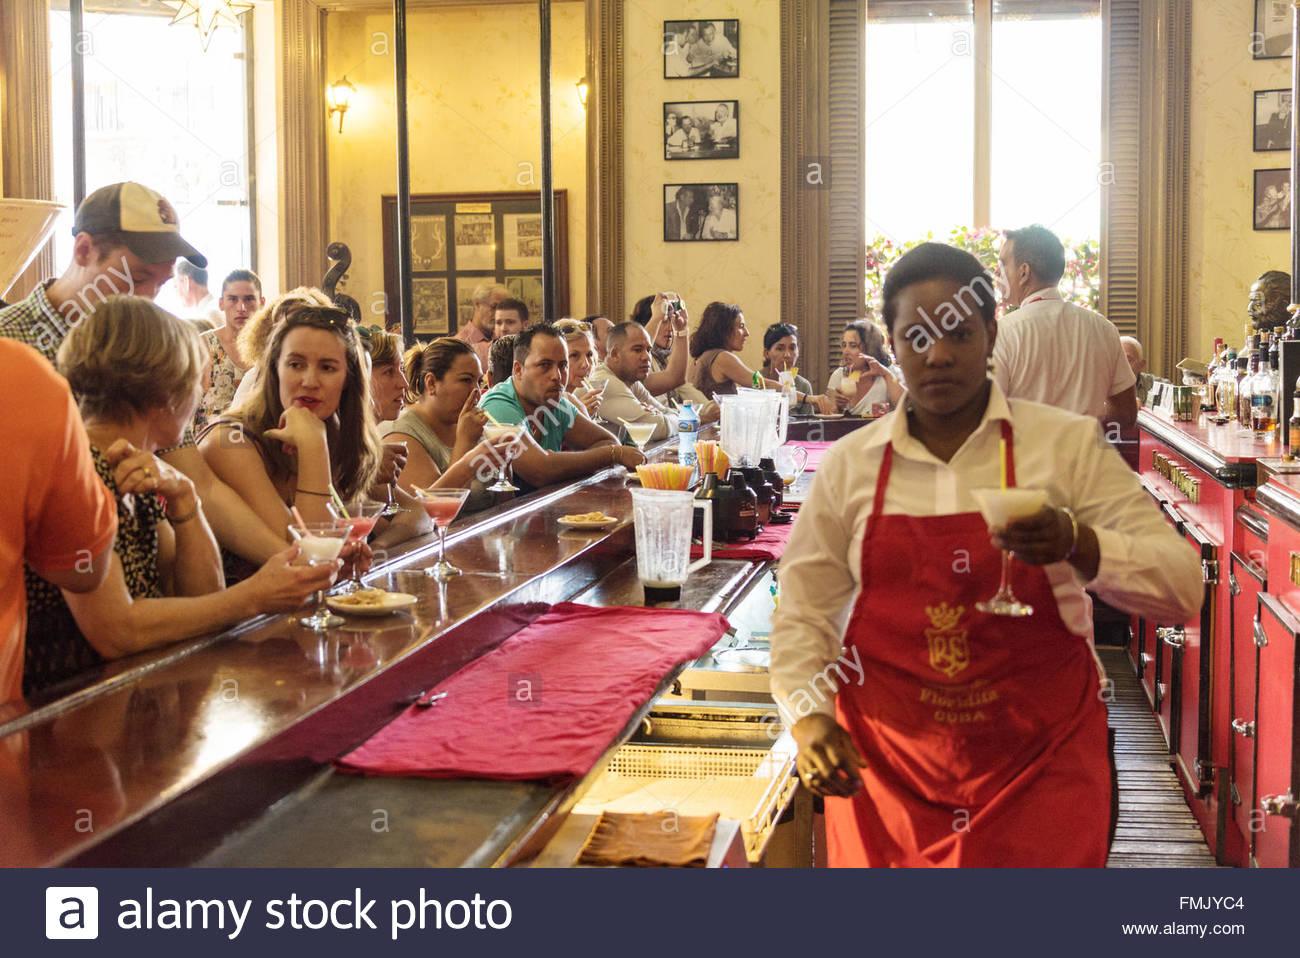 El Floridita, Havanna, Kuba: Kellnerin, Daiquiri cocktail alkoholisches Getränk für Touristen an der Bar Stockbild